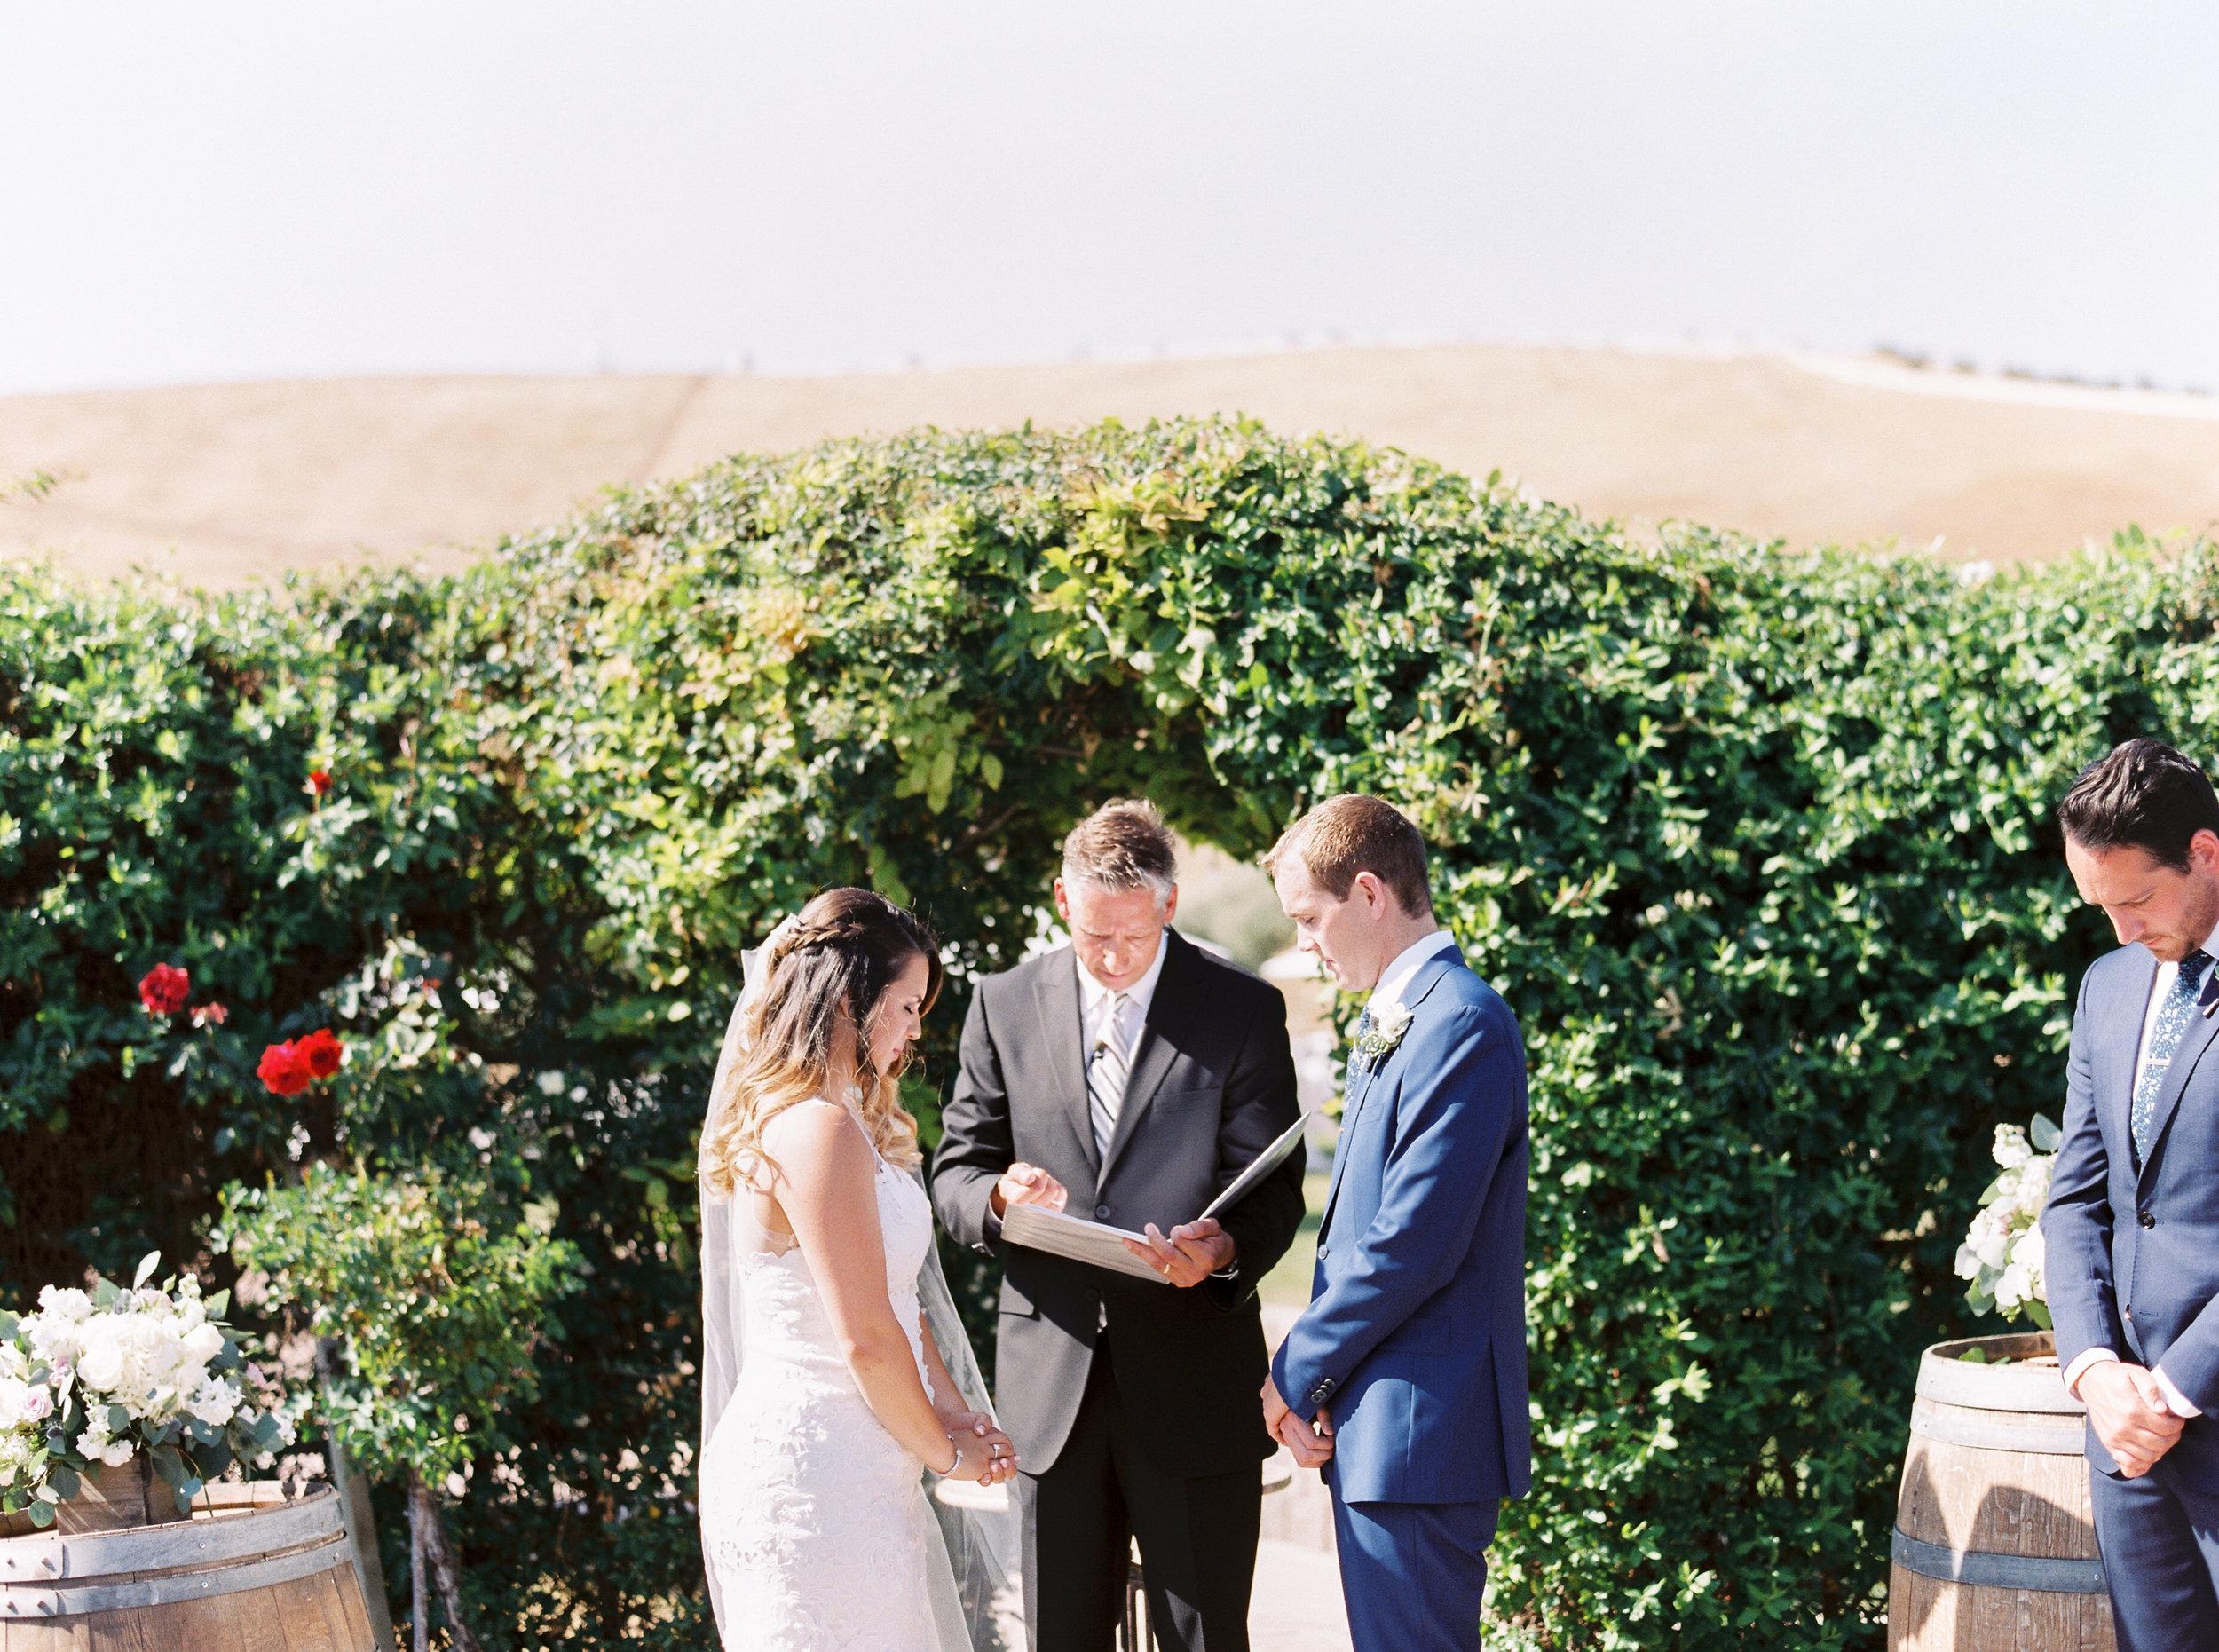 the-purple-orchid-resort-wedding-in-livermore-california-165.jpg